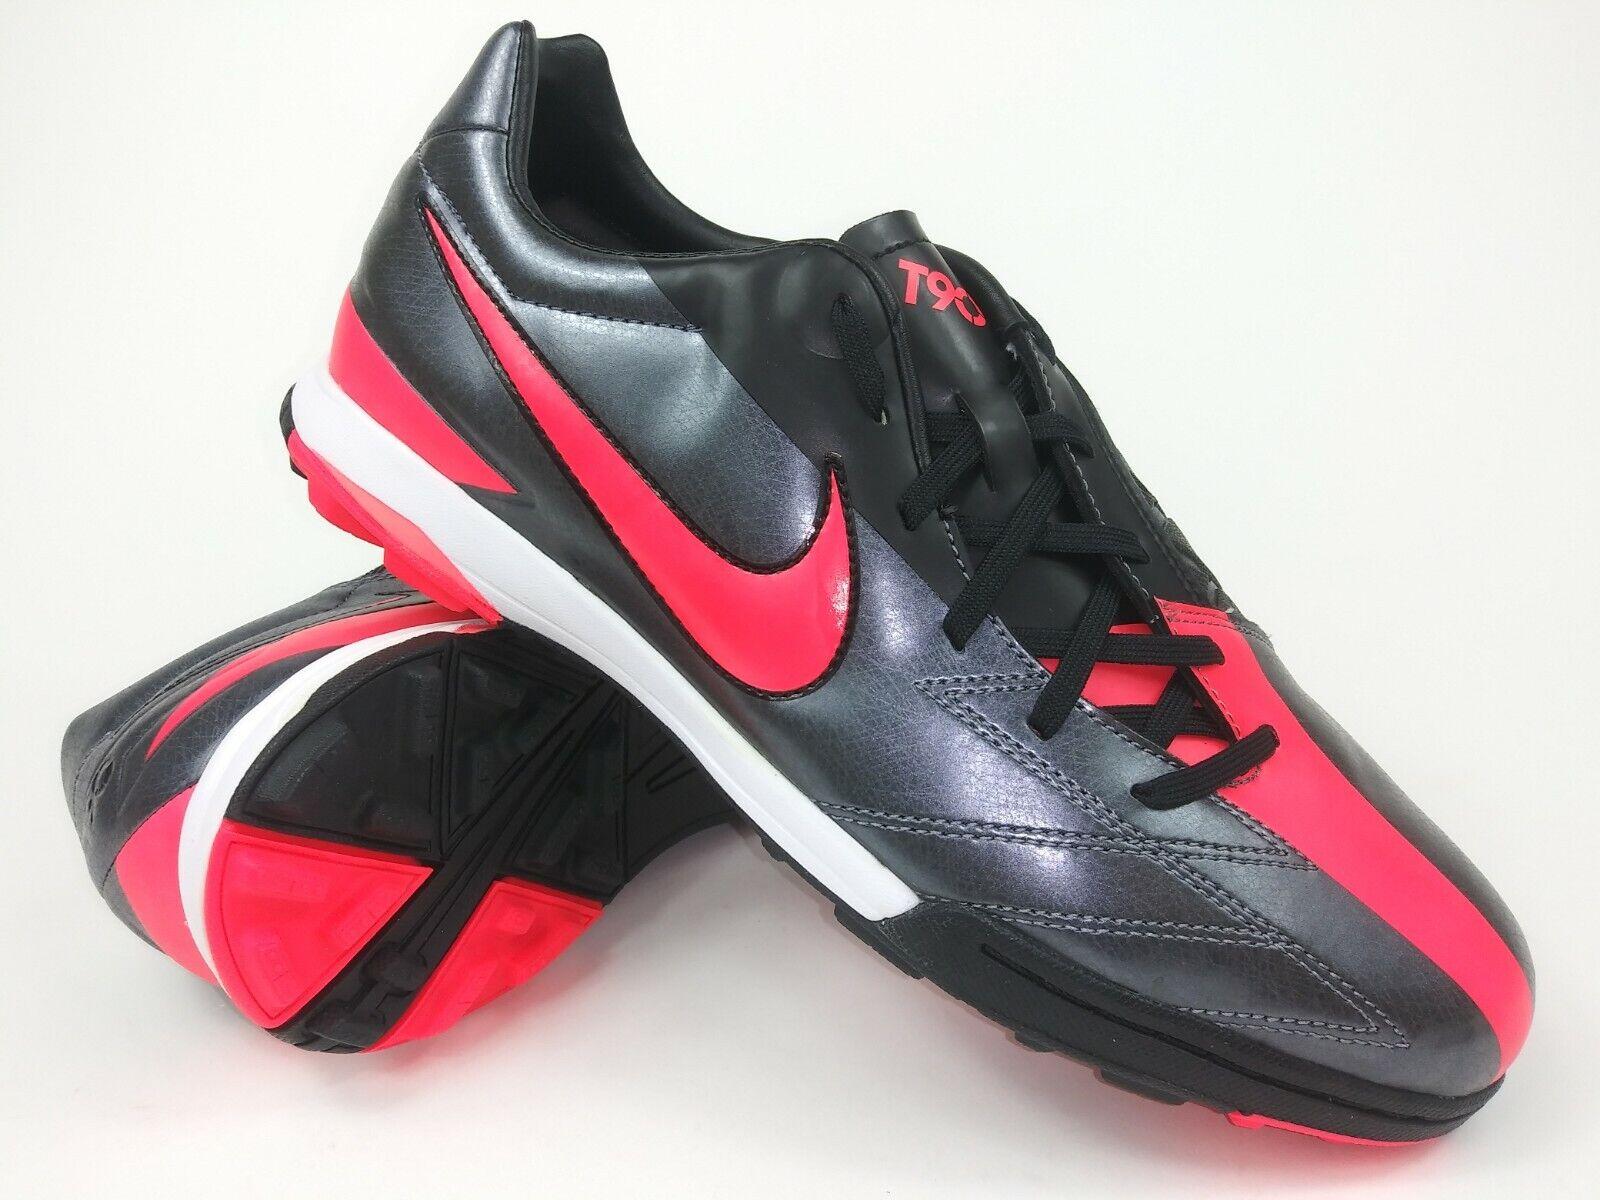 Nike Hombre Rareza T90 Dispara IV Tf 472560-060 gris Rojo Fútbol Zapatos Tacos